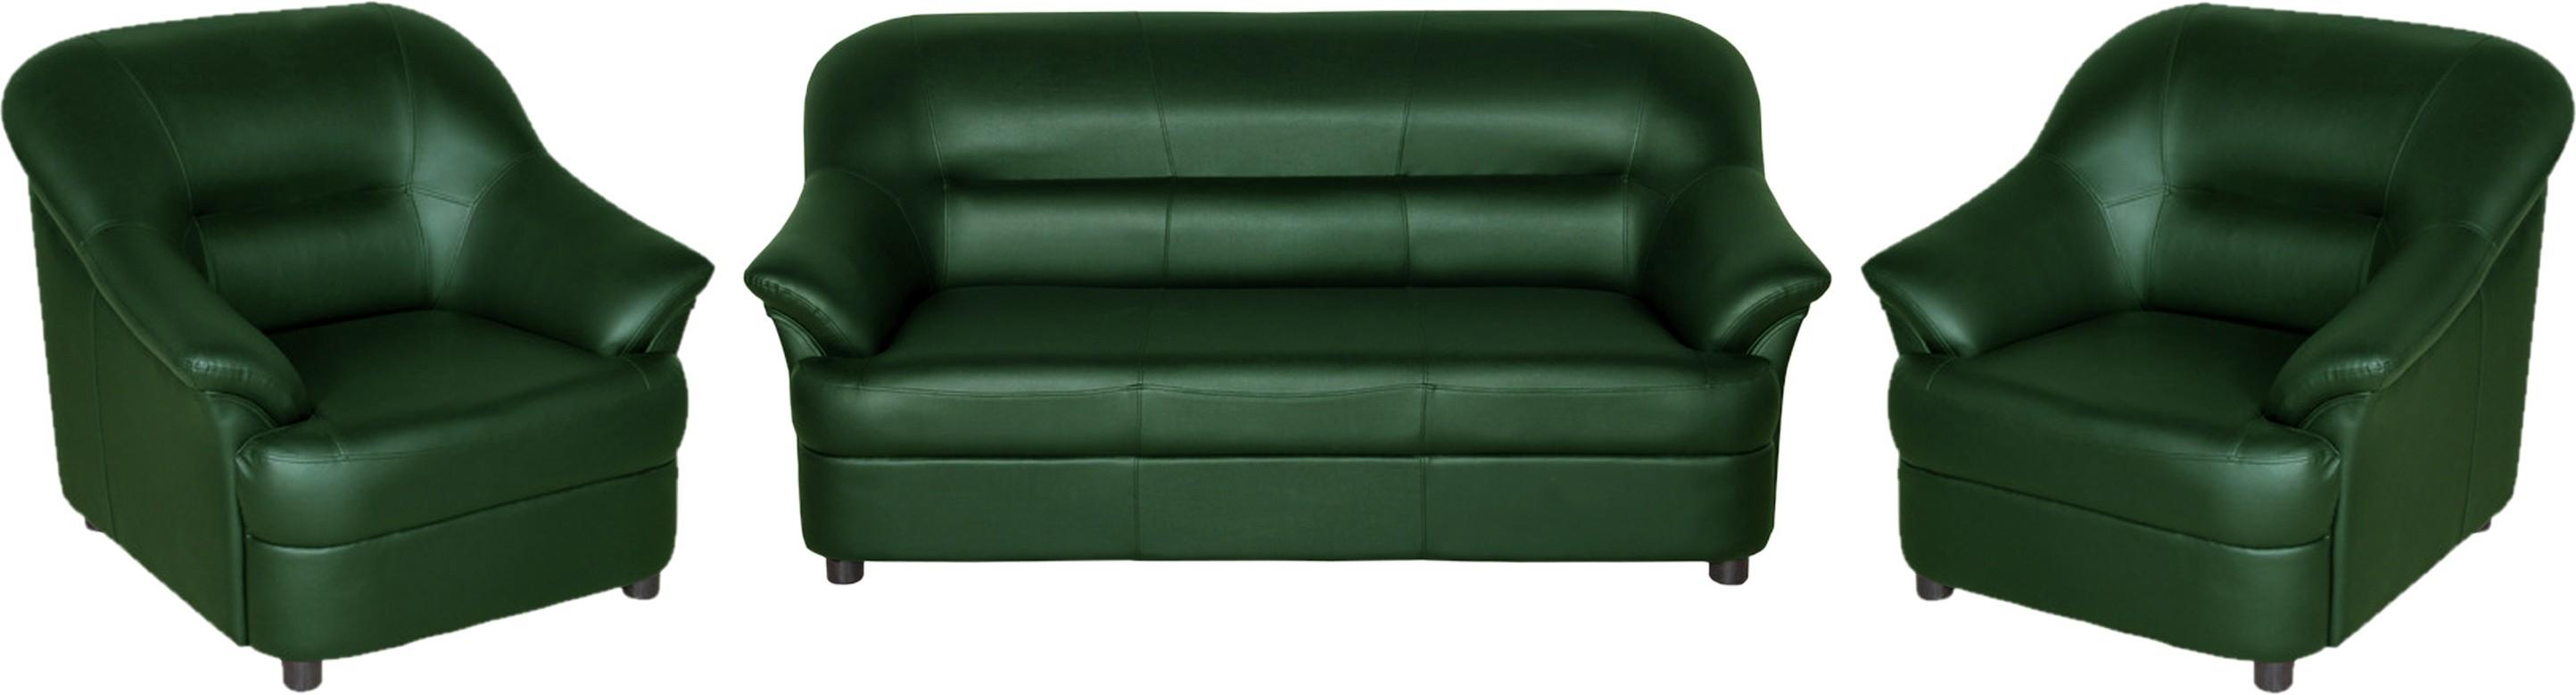 View Sethu Furniture Fabric 3 + 1 + 1 Green Sofa Set(Configuration - Straight) Furniture (Sethu Furniture)